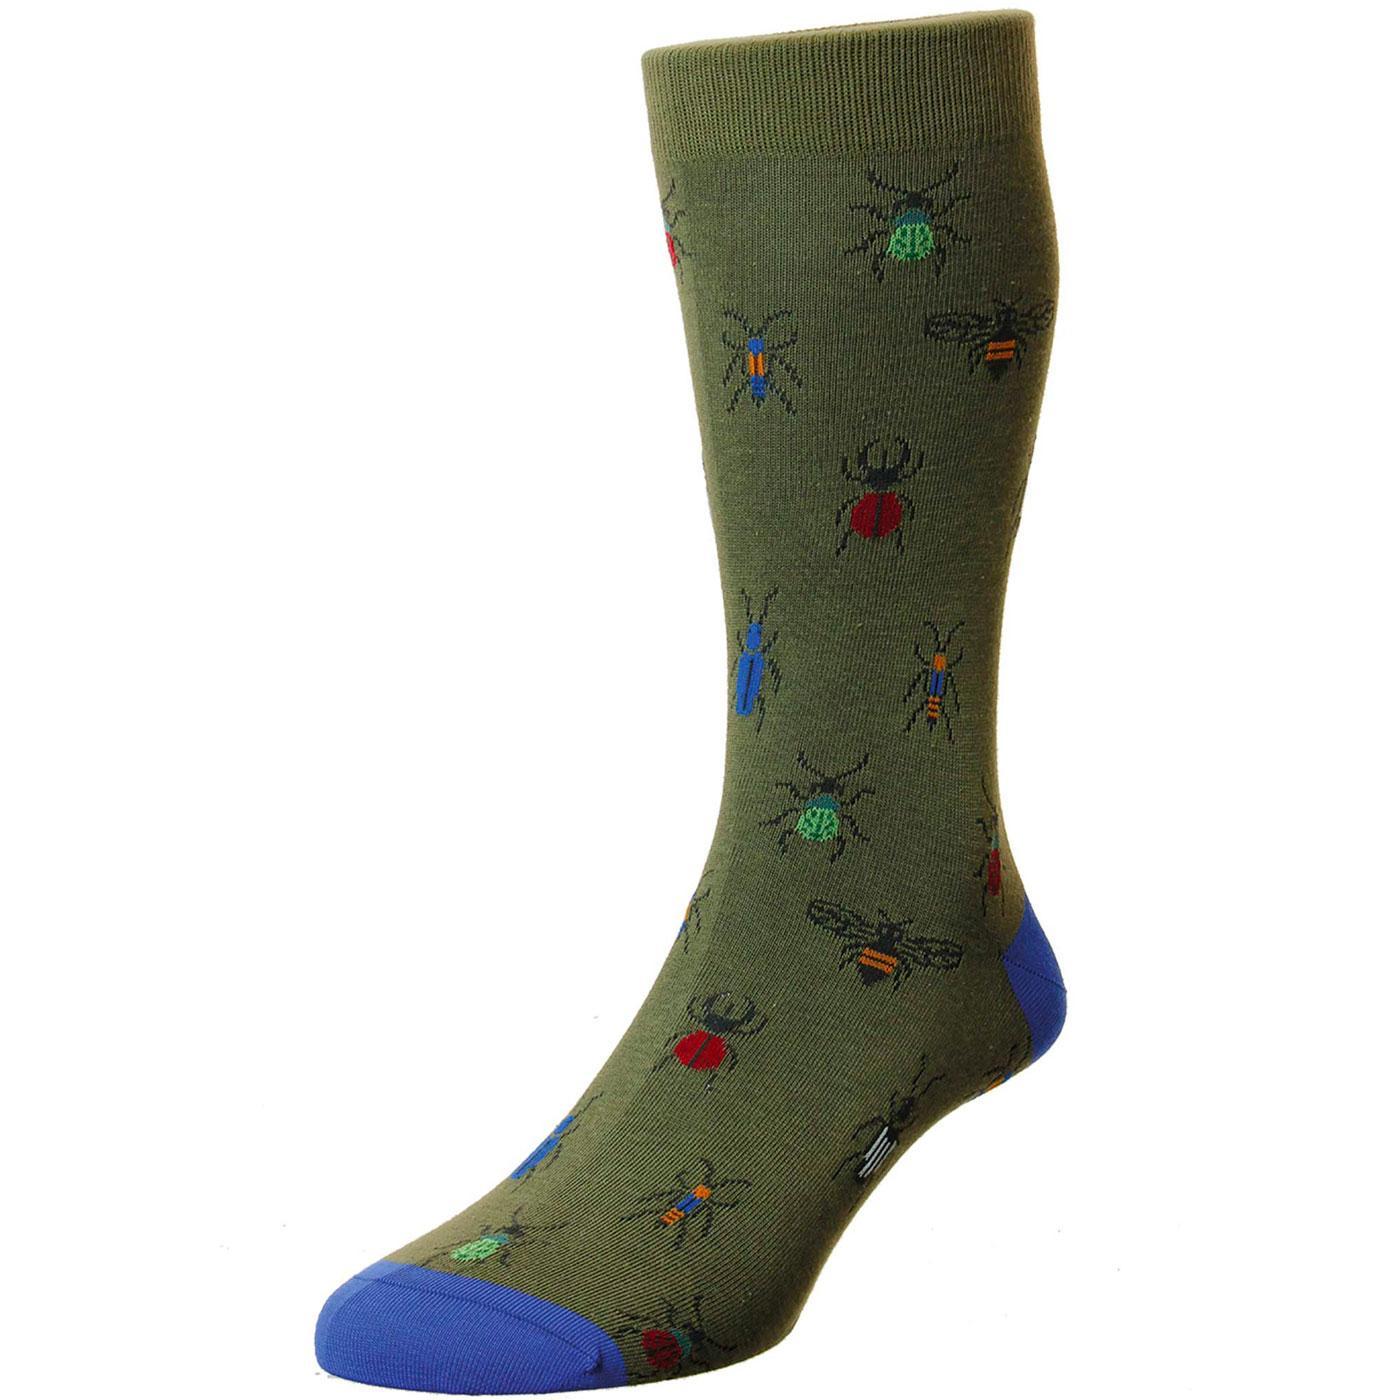 + Hexa SCOTT-NICHOL Made in England Beetle Socks